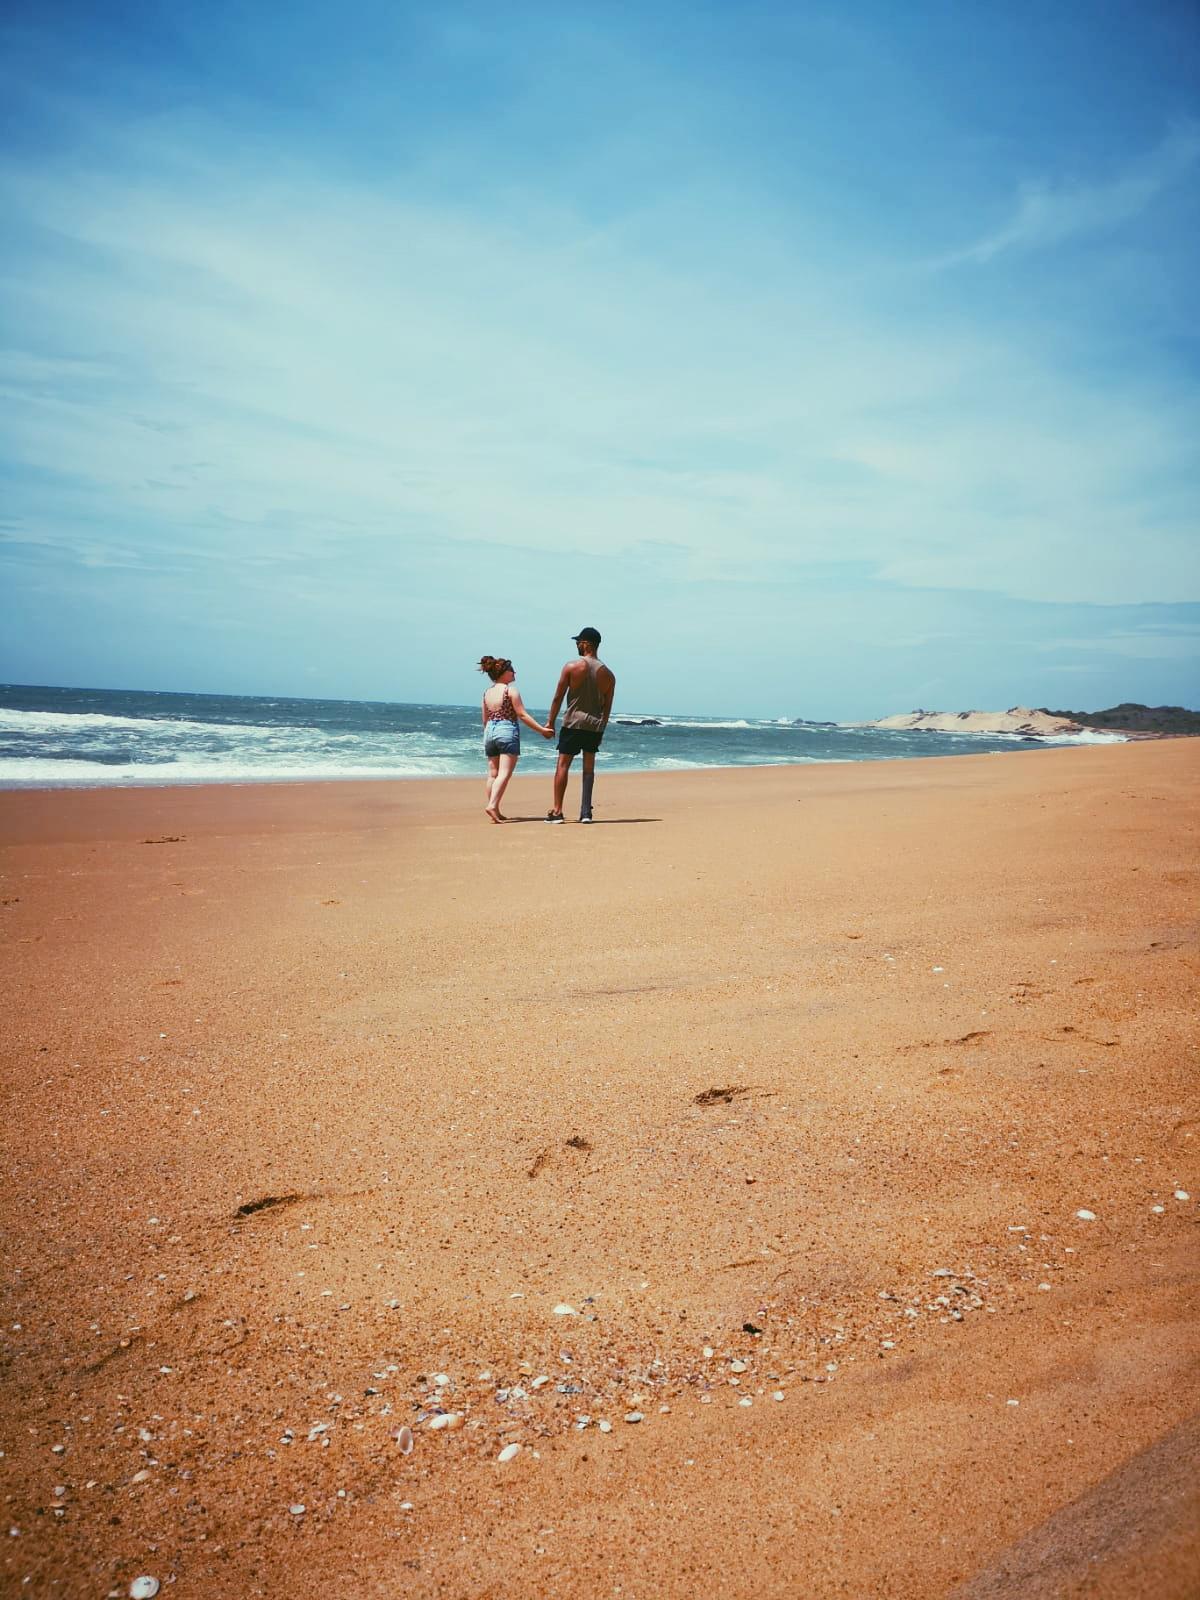 invite-to-paradise-sri-lanka-holiday-honeymoon-specialists-customer-feedback-elin-jordan-luce-yala-beach-stroll.JPG